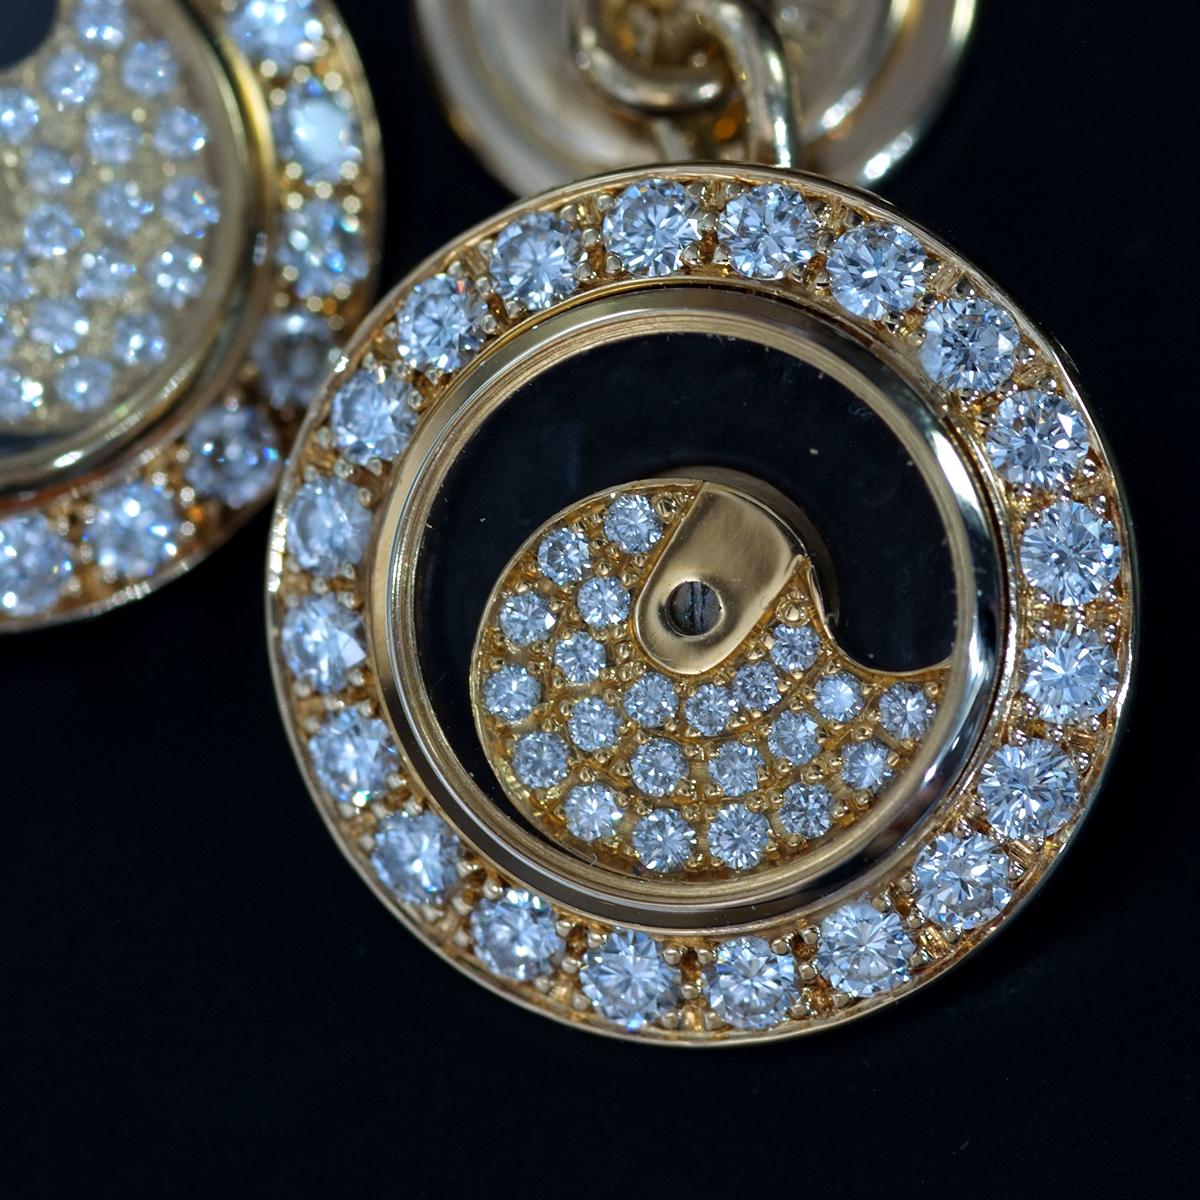 F0197【SARCAR】サーカー 天然絶品ダイヤモンド84pcs 最高級18金無垢セレブリティカフス 重量18.0g 幅16.7mm_画像3